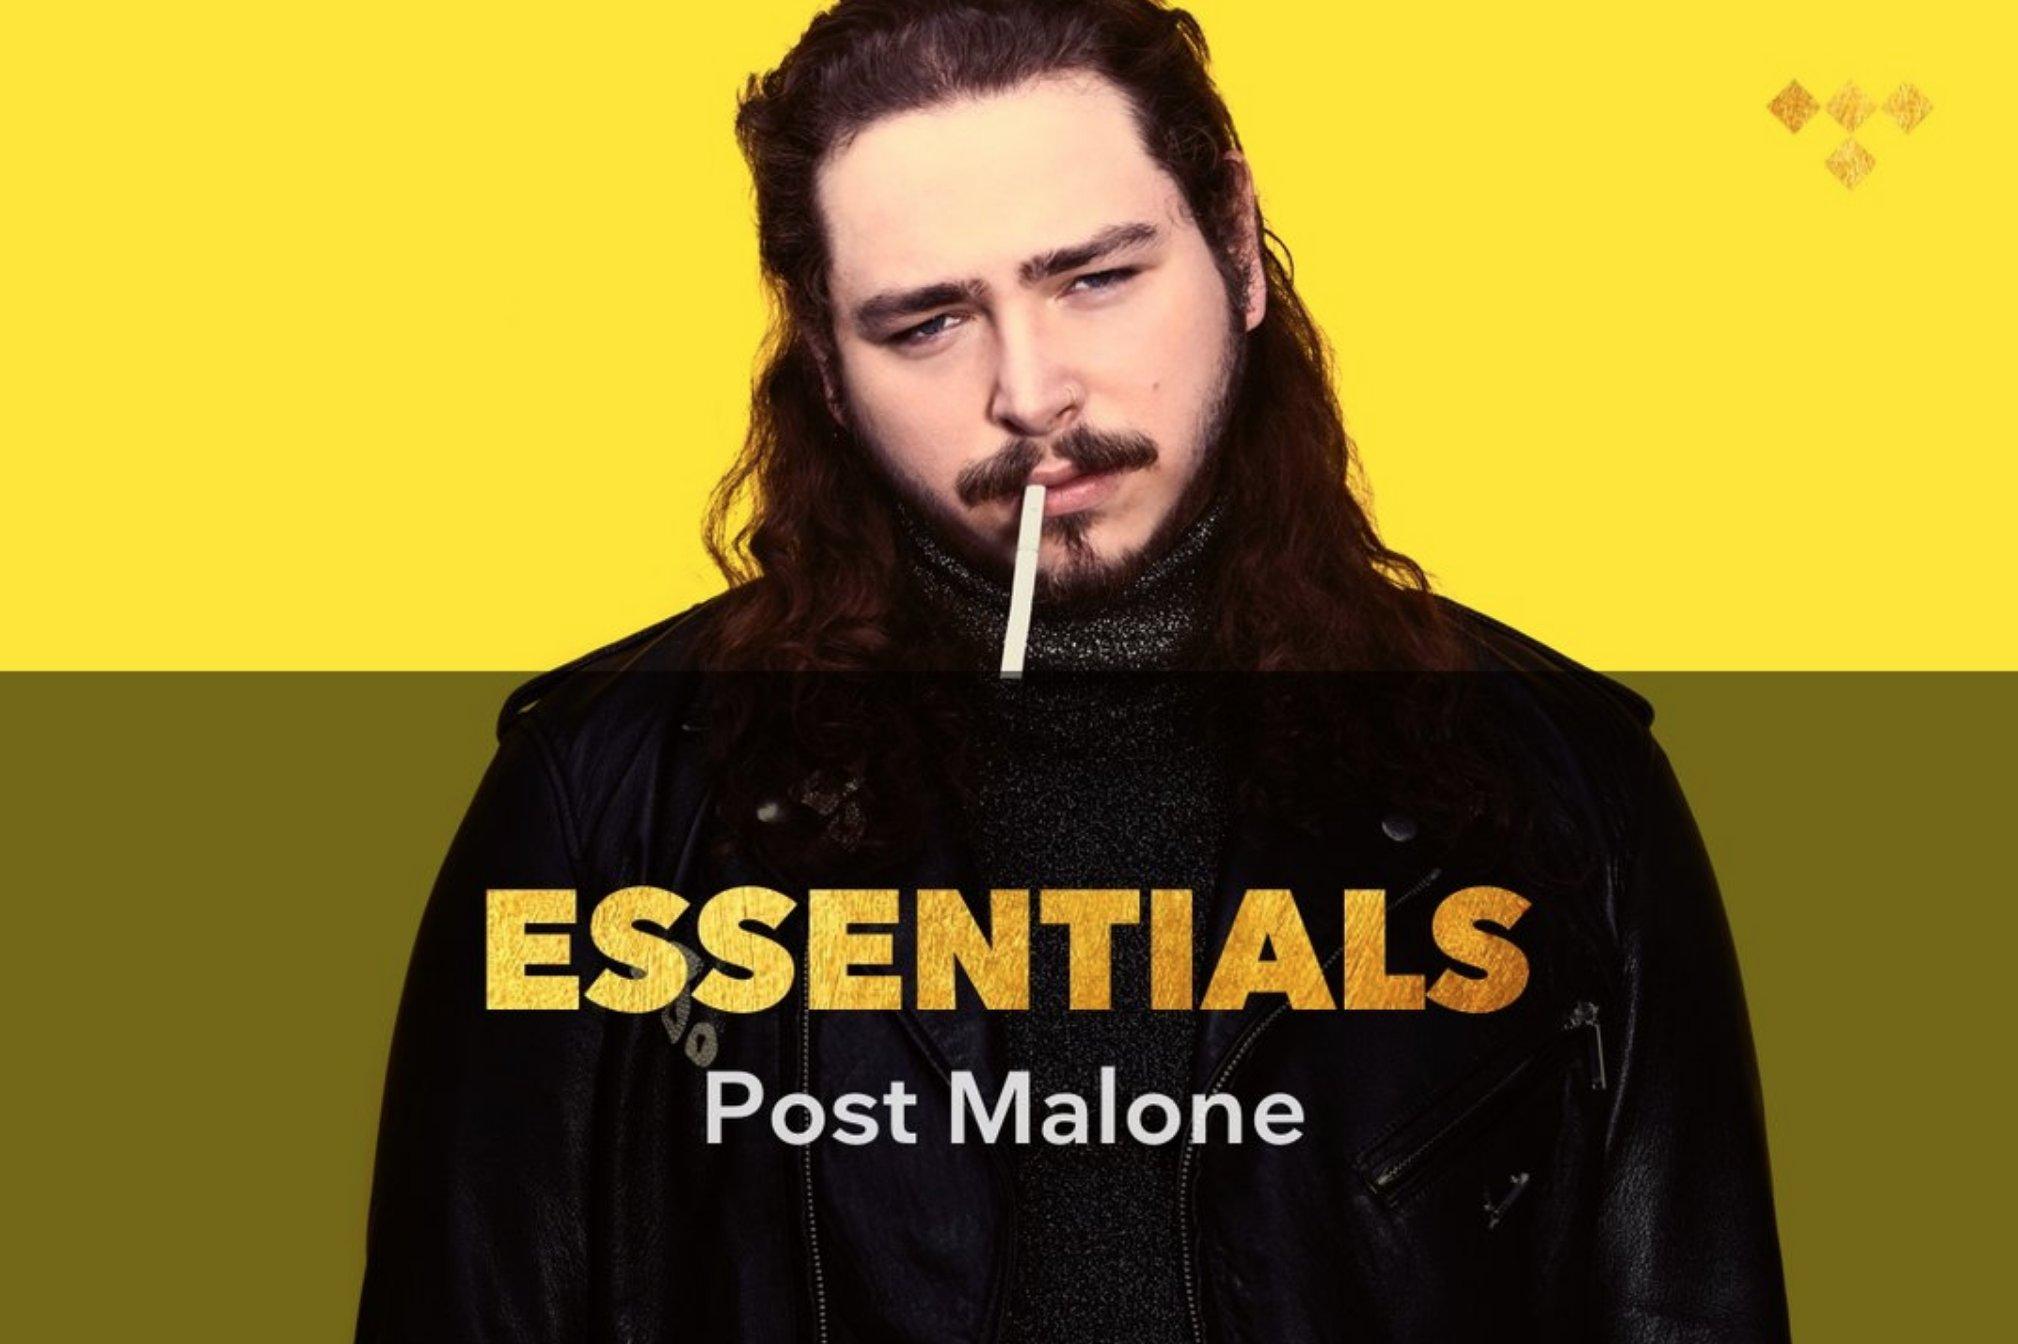 Post Malone Essentials https://t.co/jZU315GDw7 #TIDAL https://t.co/EFcv57NVUW